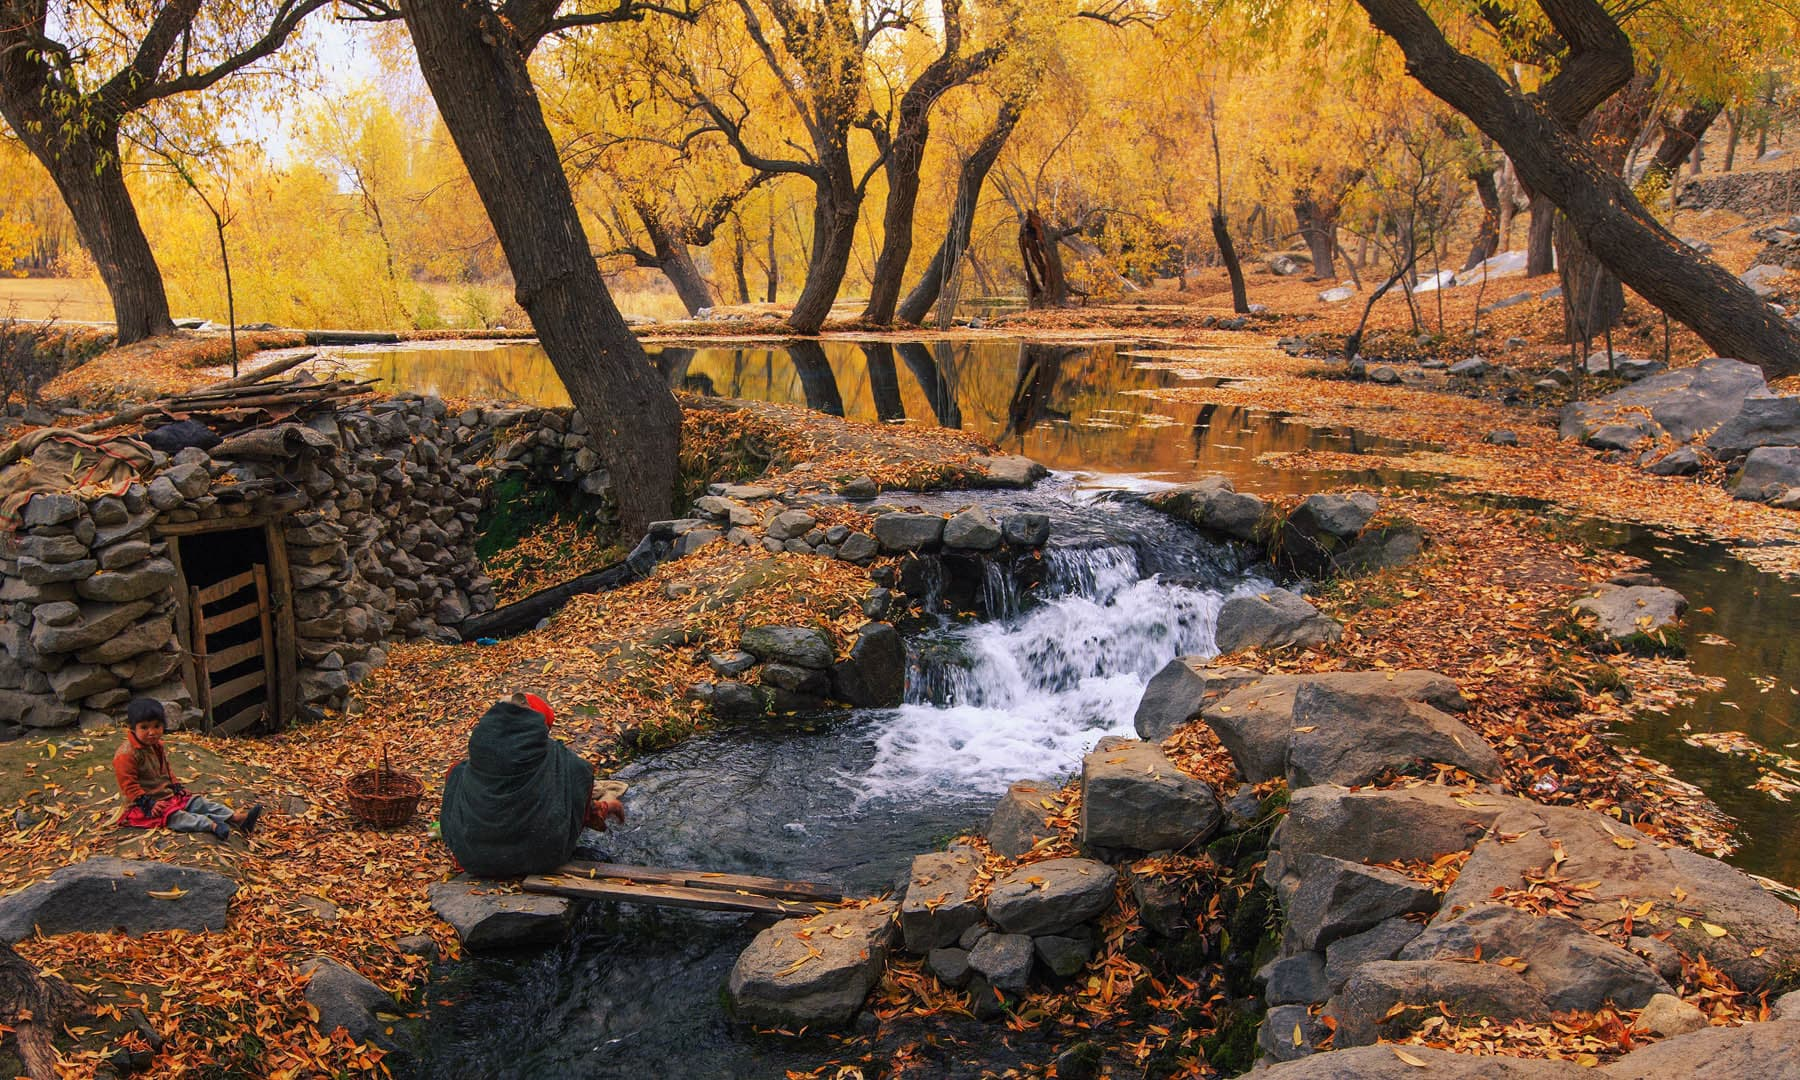 Daily life in Khaplu. — S.M.Bukhari